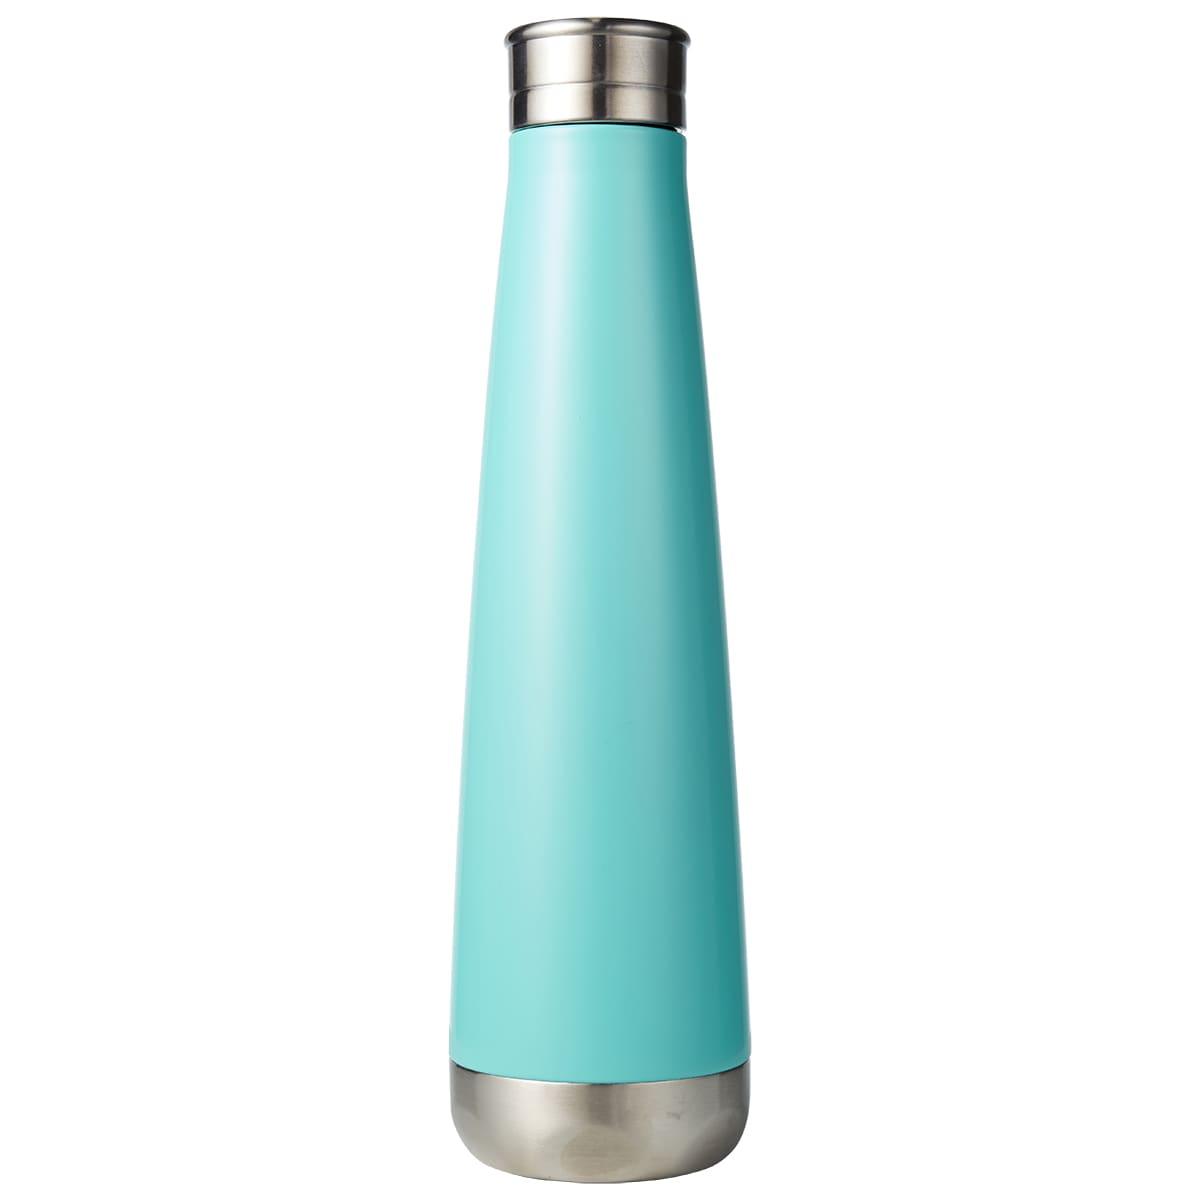 Aqua Lily Mirror Finish Vaccuum Bottle by HydroSoul